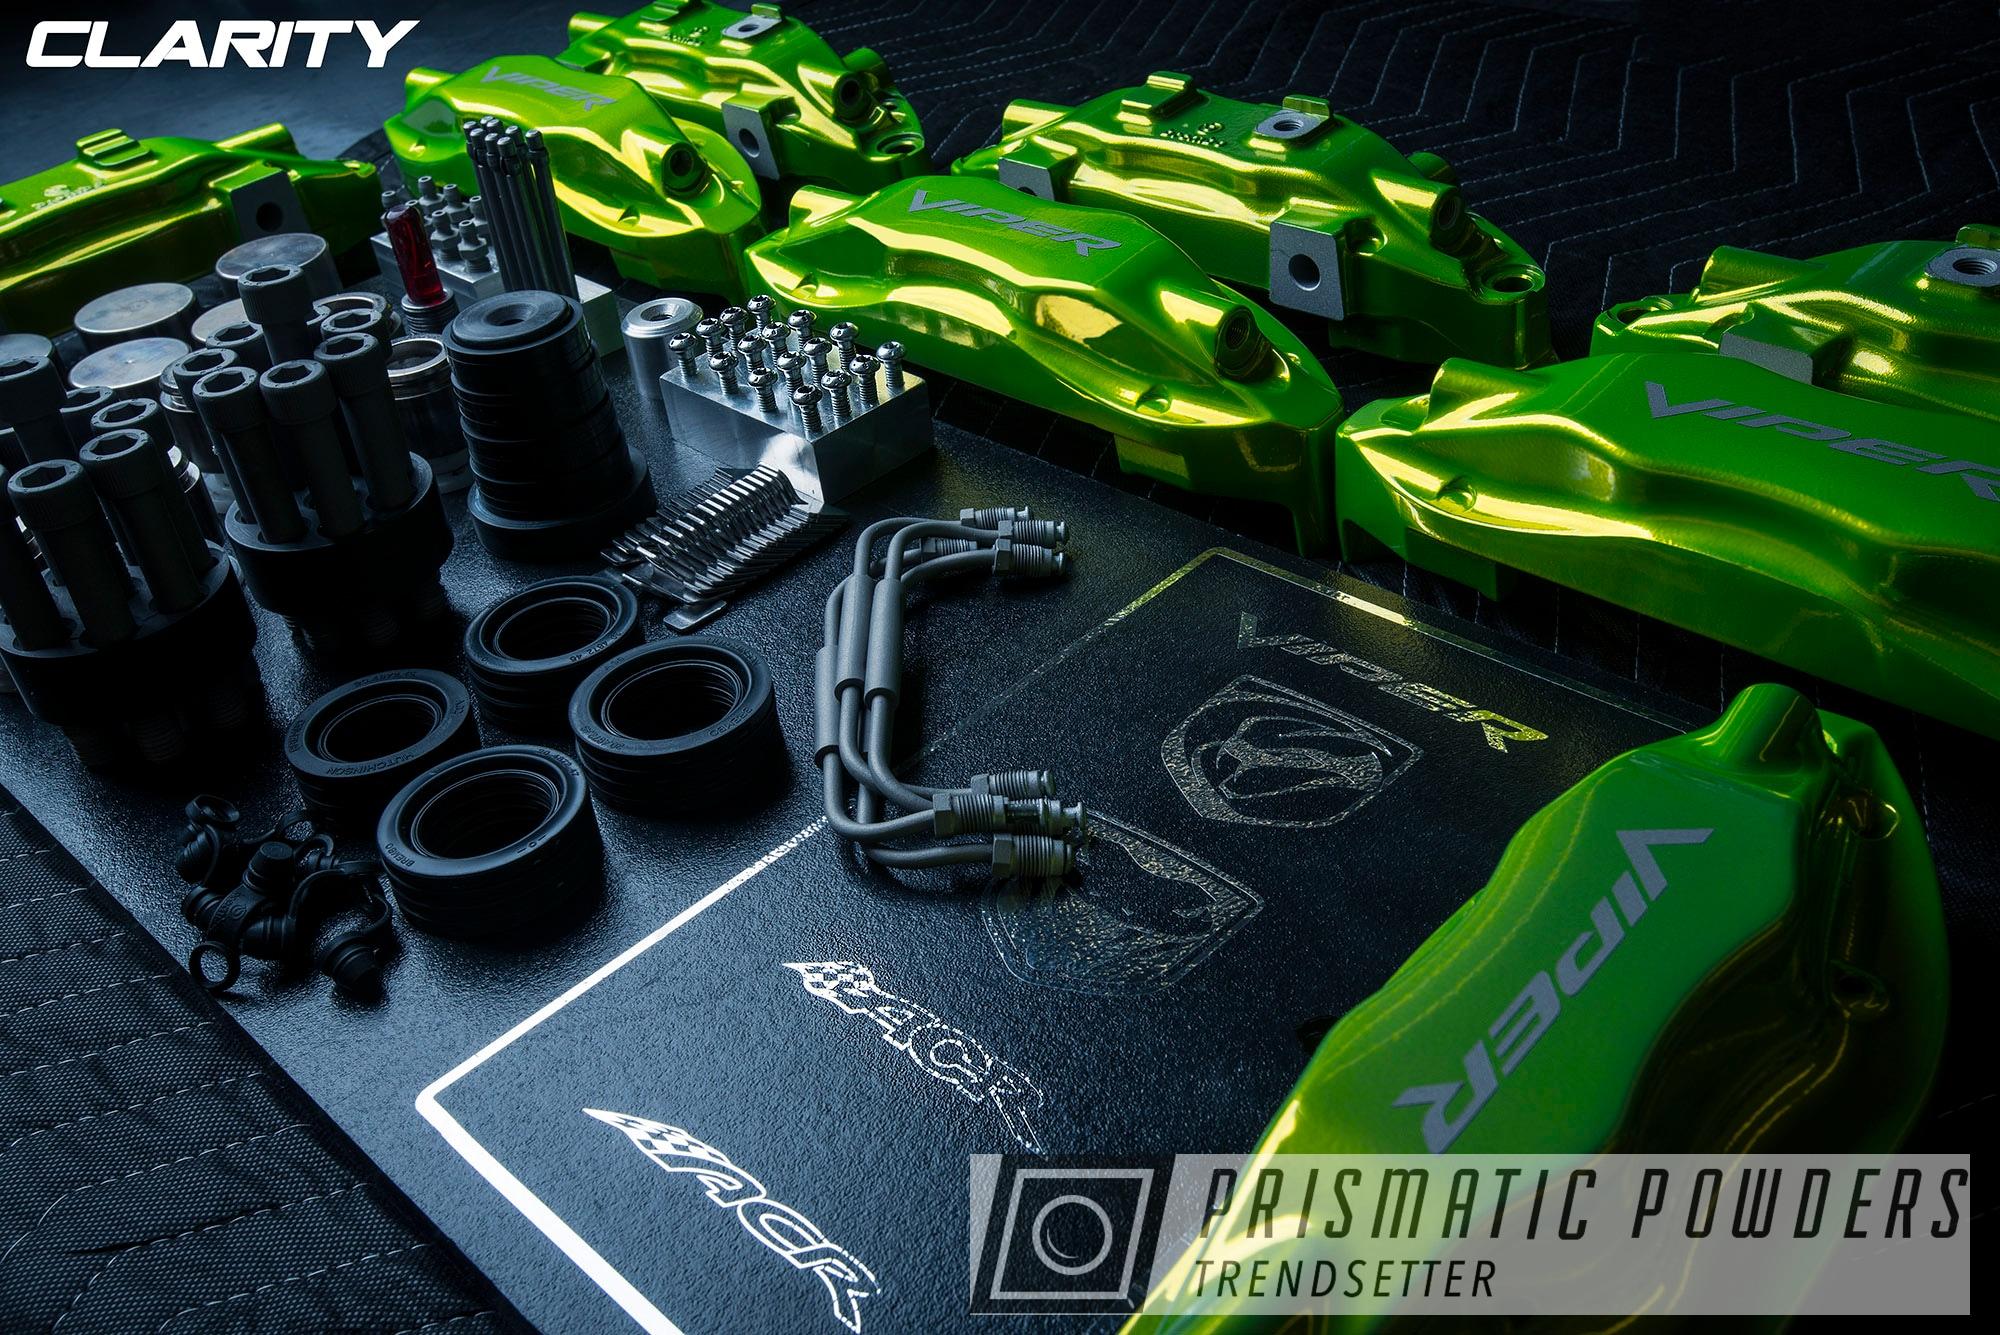 Powder Coating: Automotive,Brakes,SUPER CHROME USS-4482,Brembo,Brake Calipers,Dodge,viper,Shocker Yellow PPS-4765,Dodge Viper,driveclarity